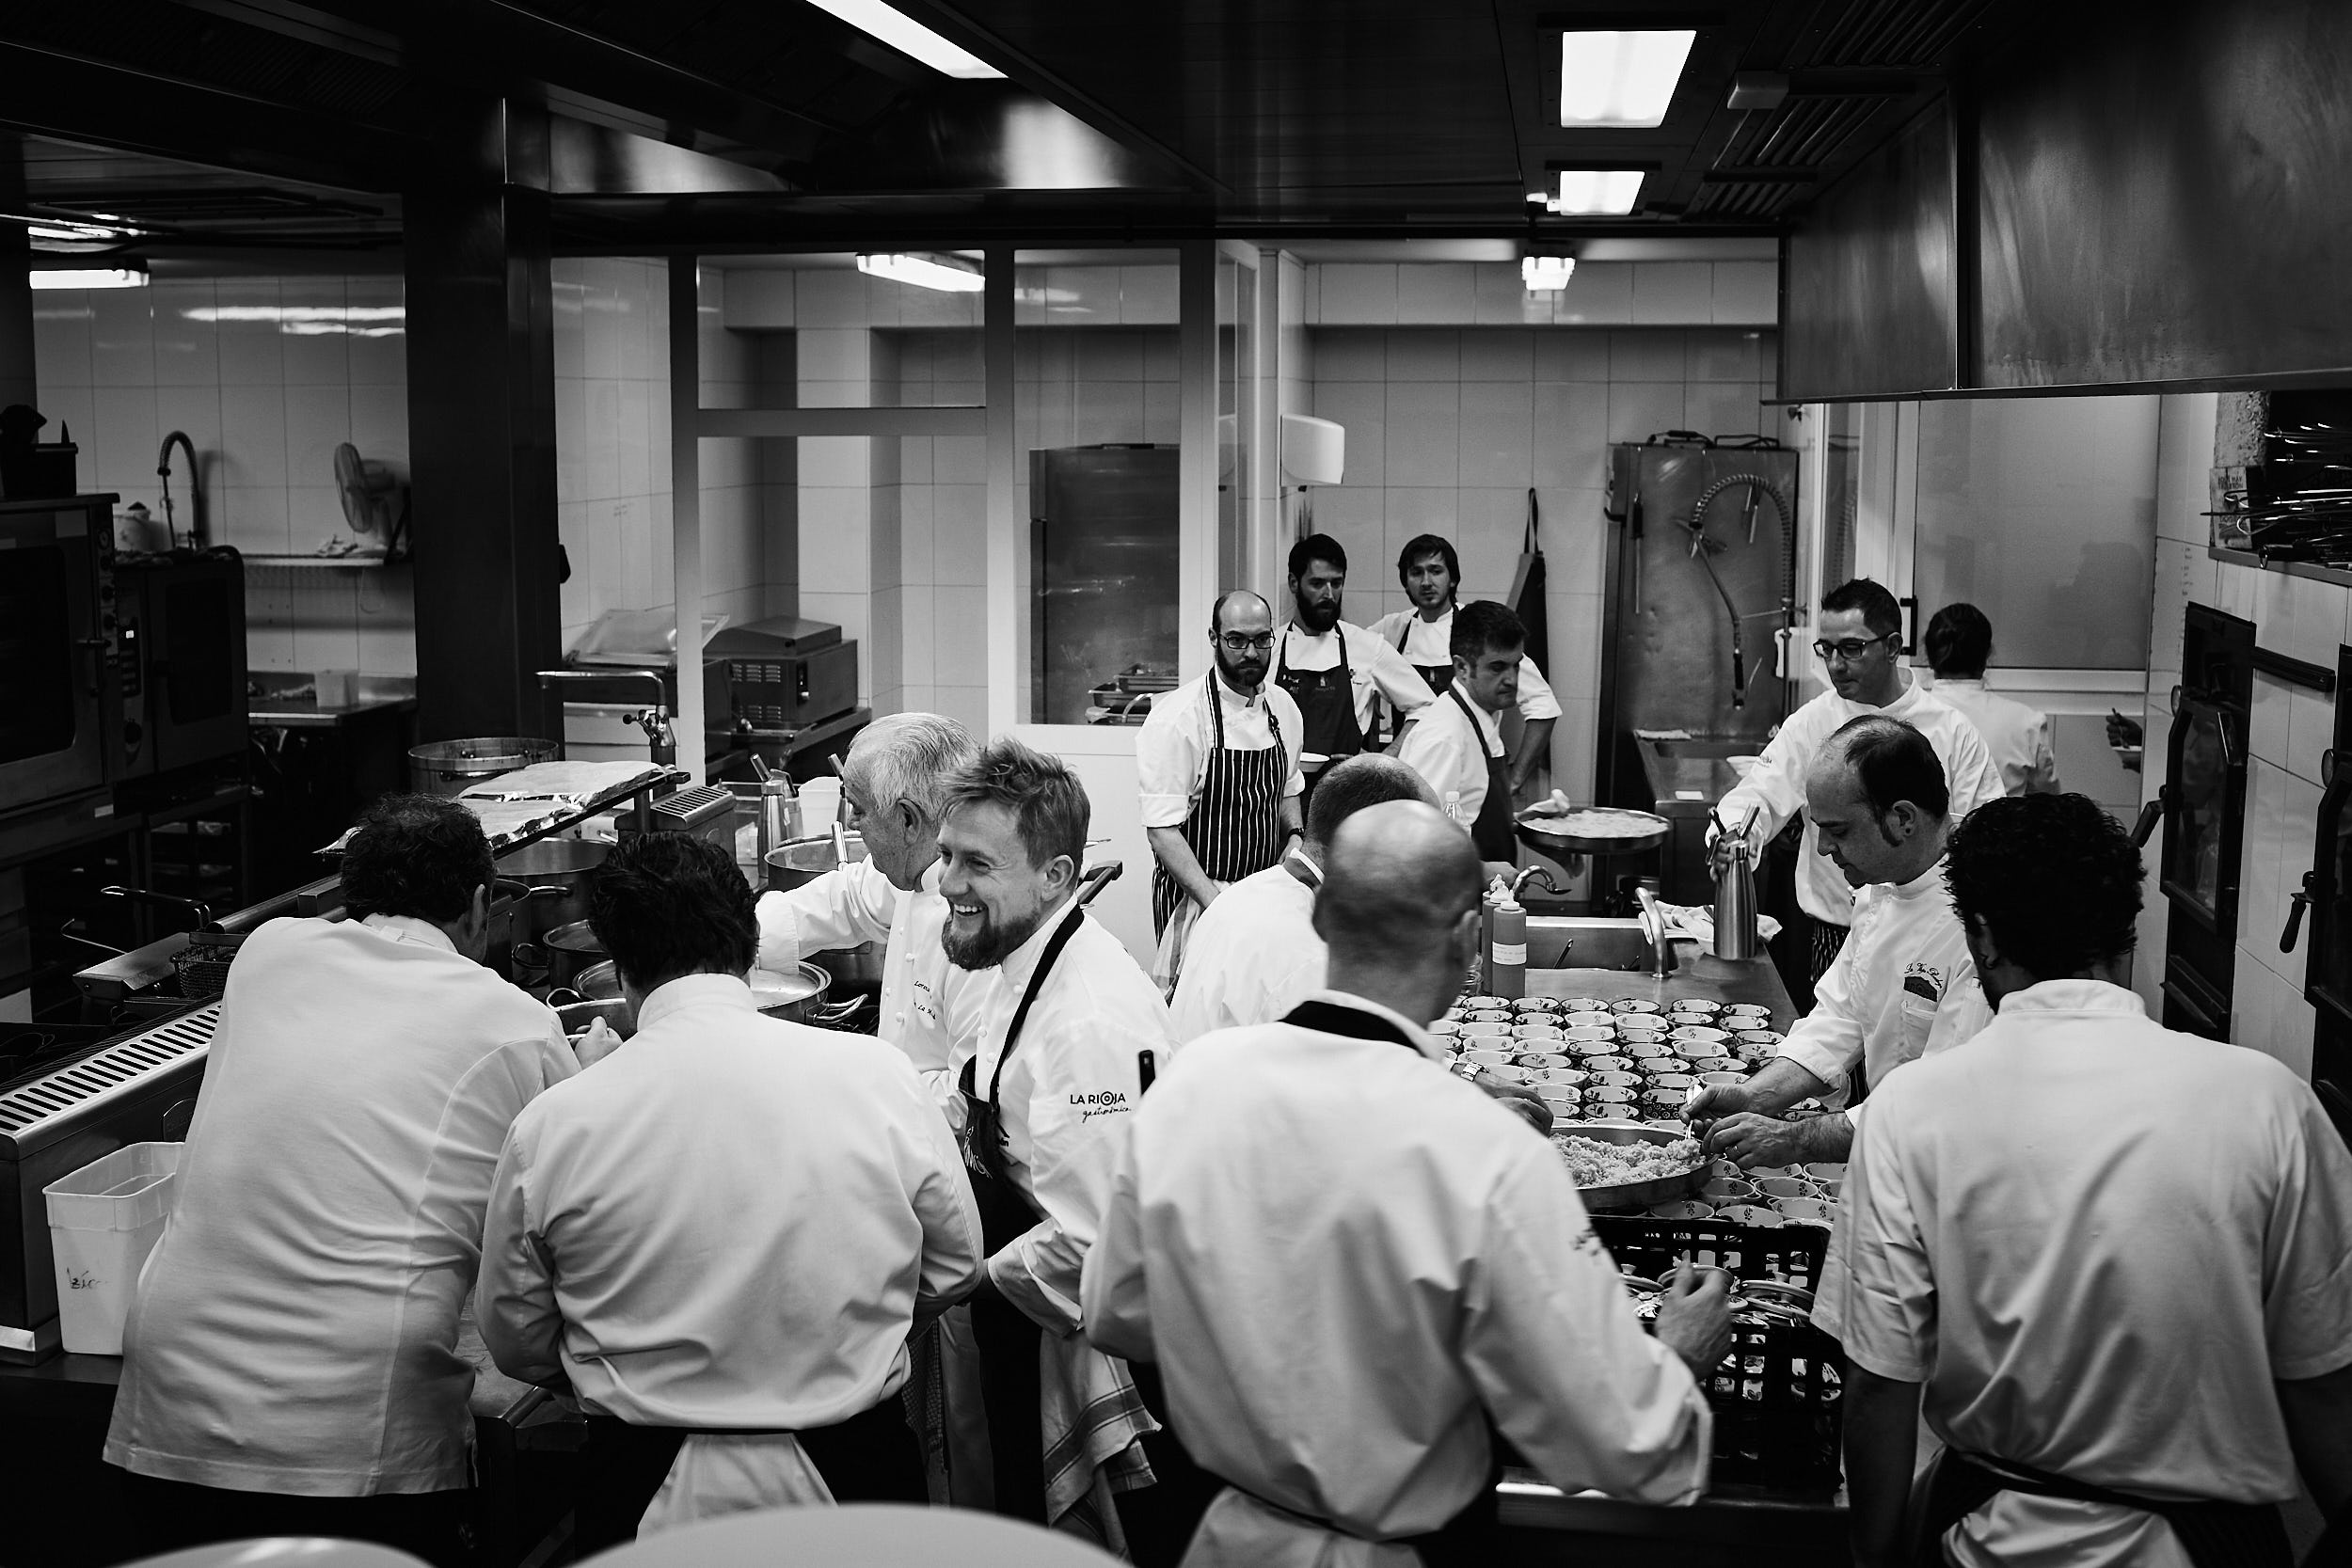 1903Restaurante_La_Vieja_Bodega_Casalarreina_La_Rioja_Spain_Sturcke_0012.jpg